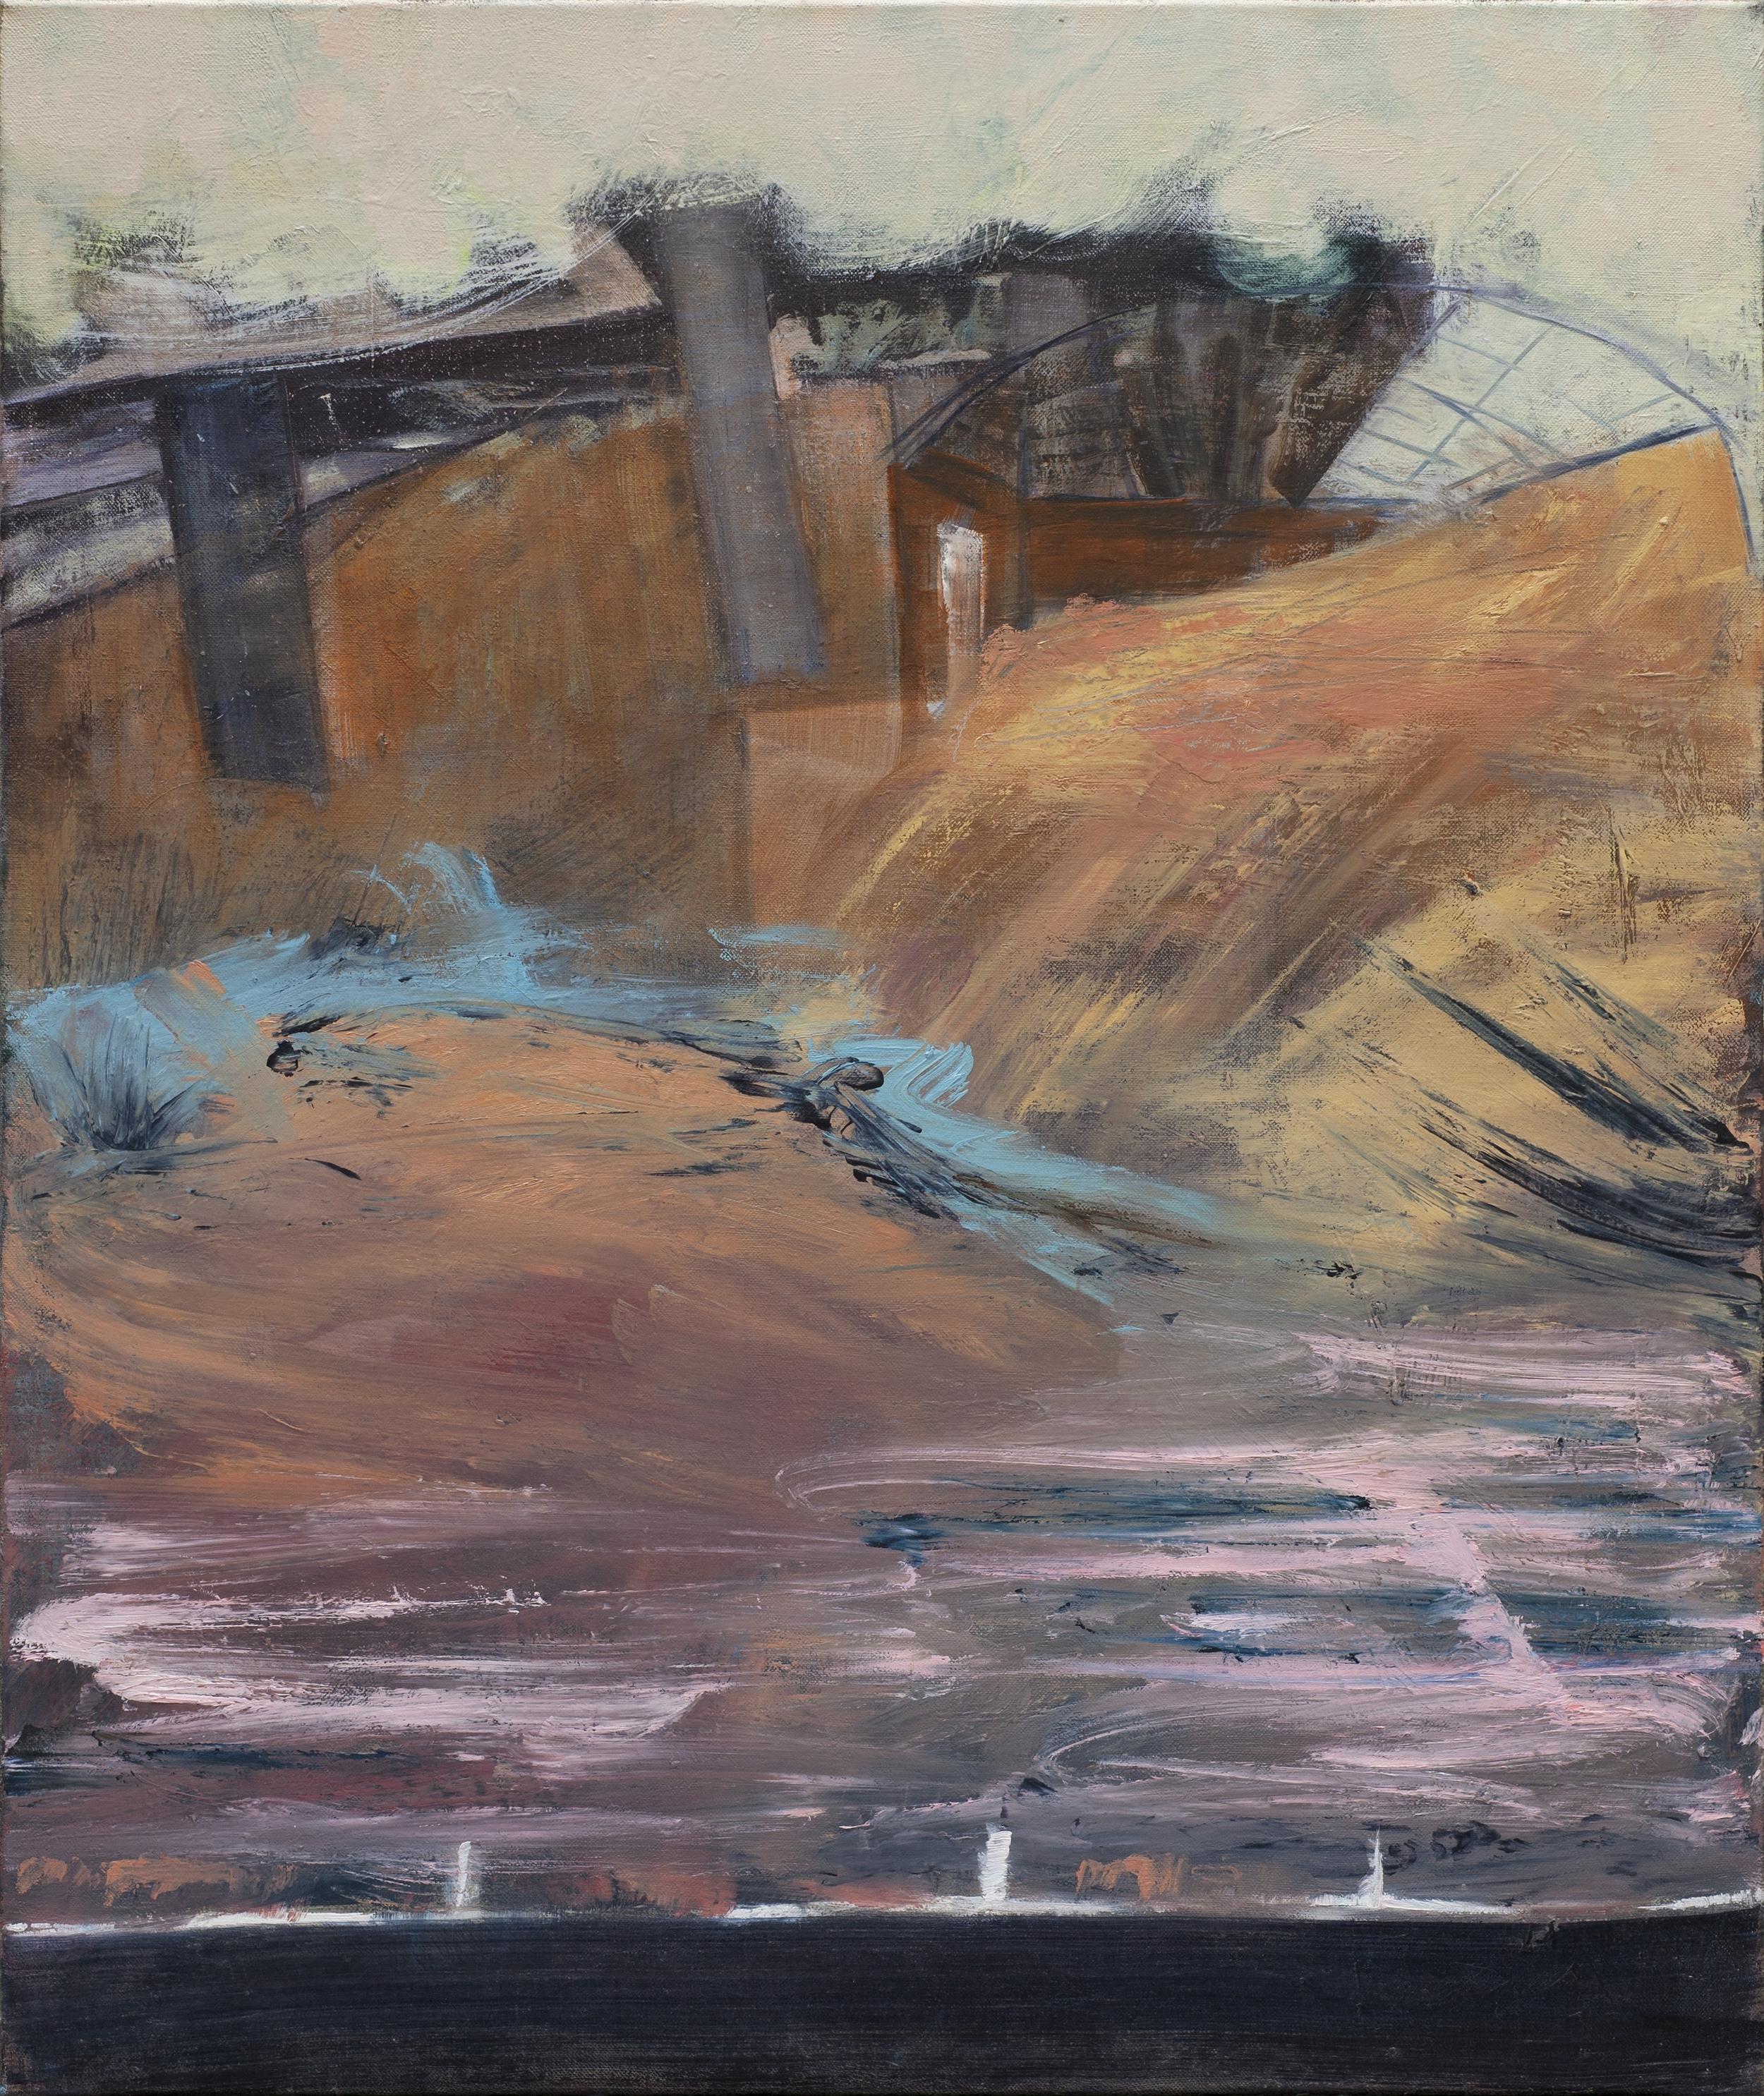 Stunde t = 0, oil on canvas (III), 90 x 95,5 cm